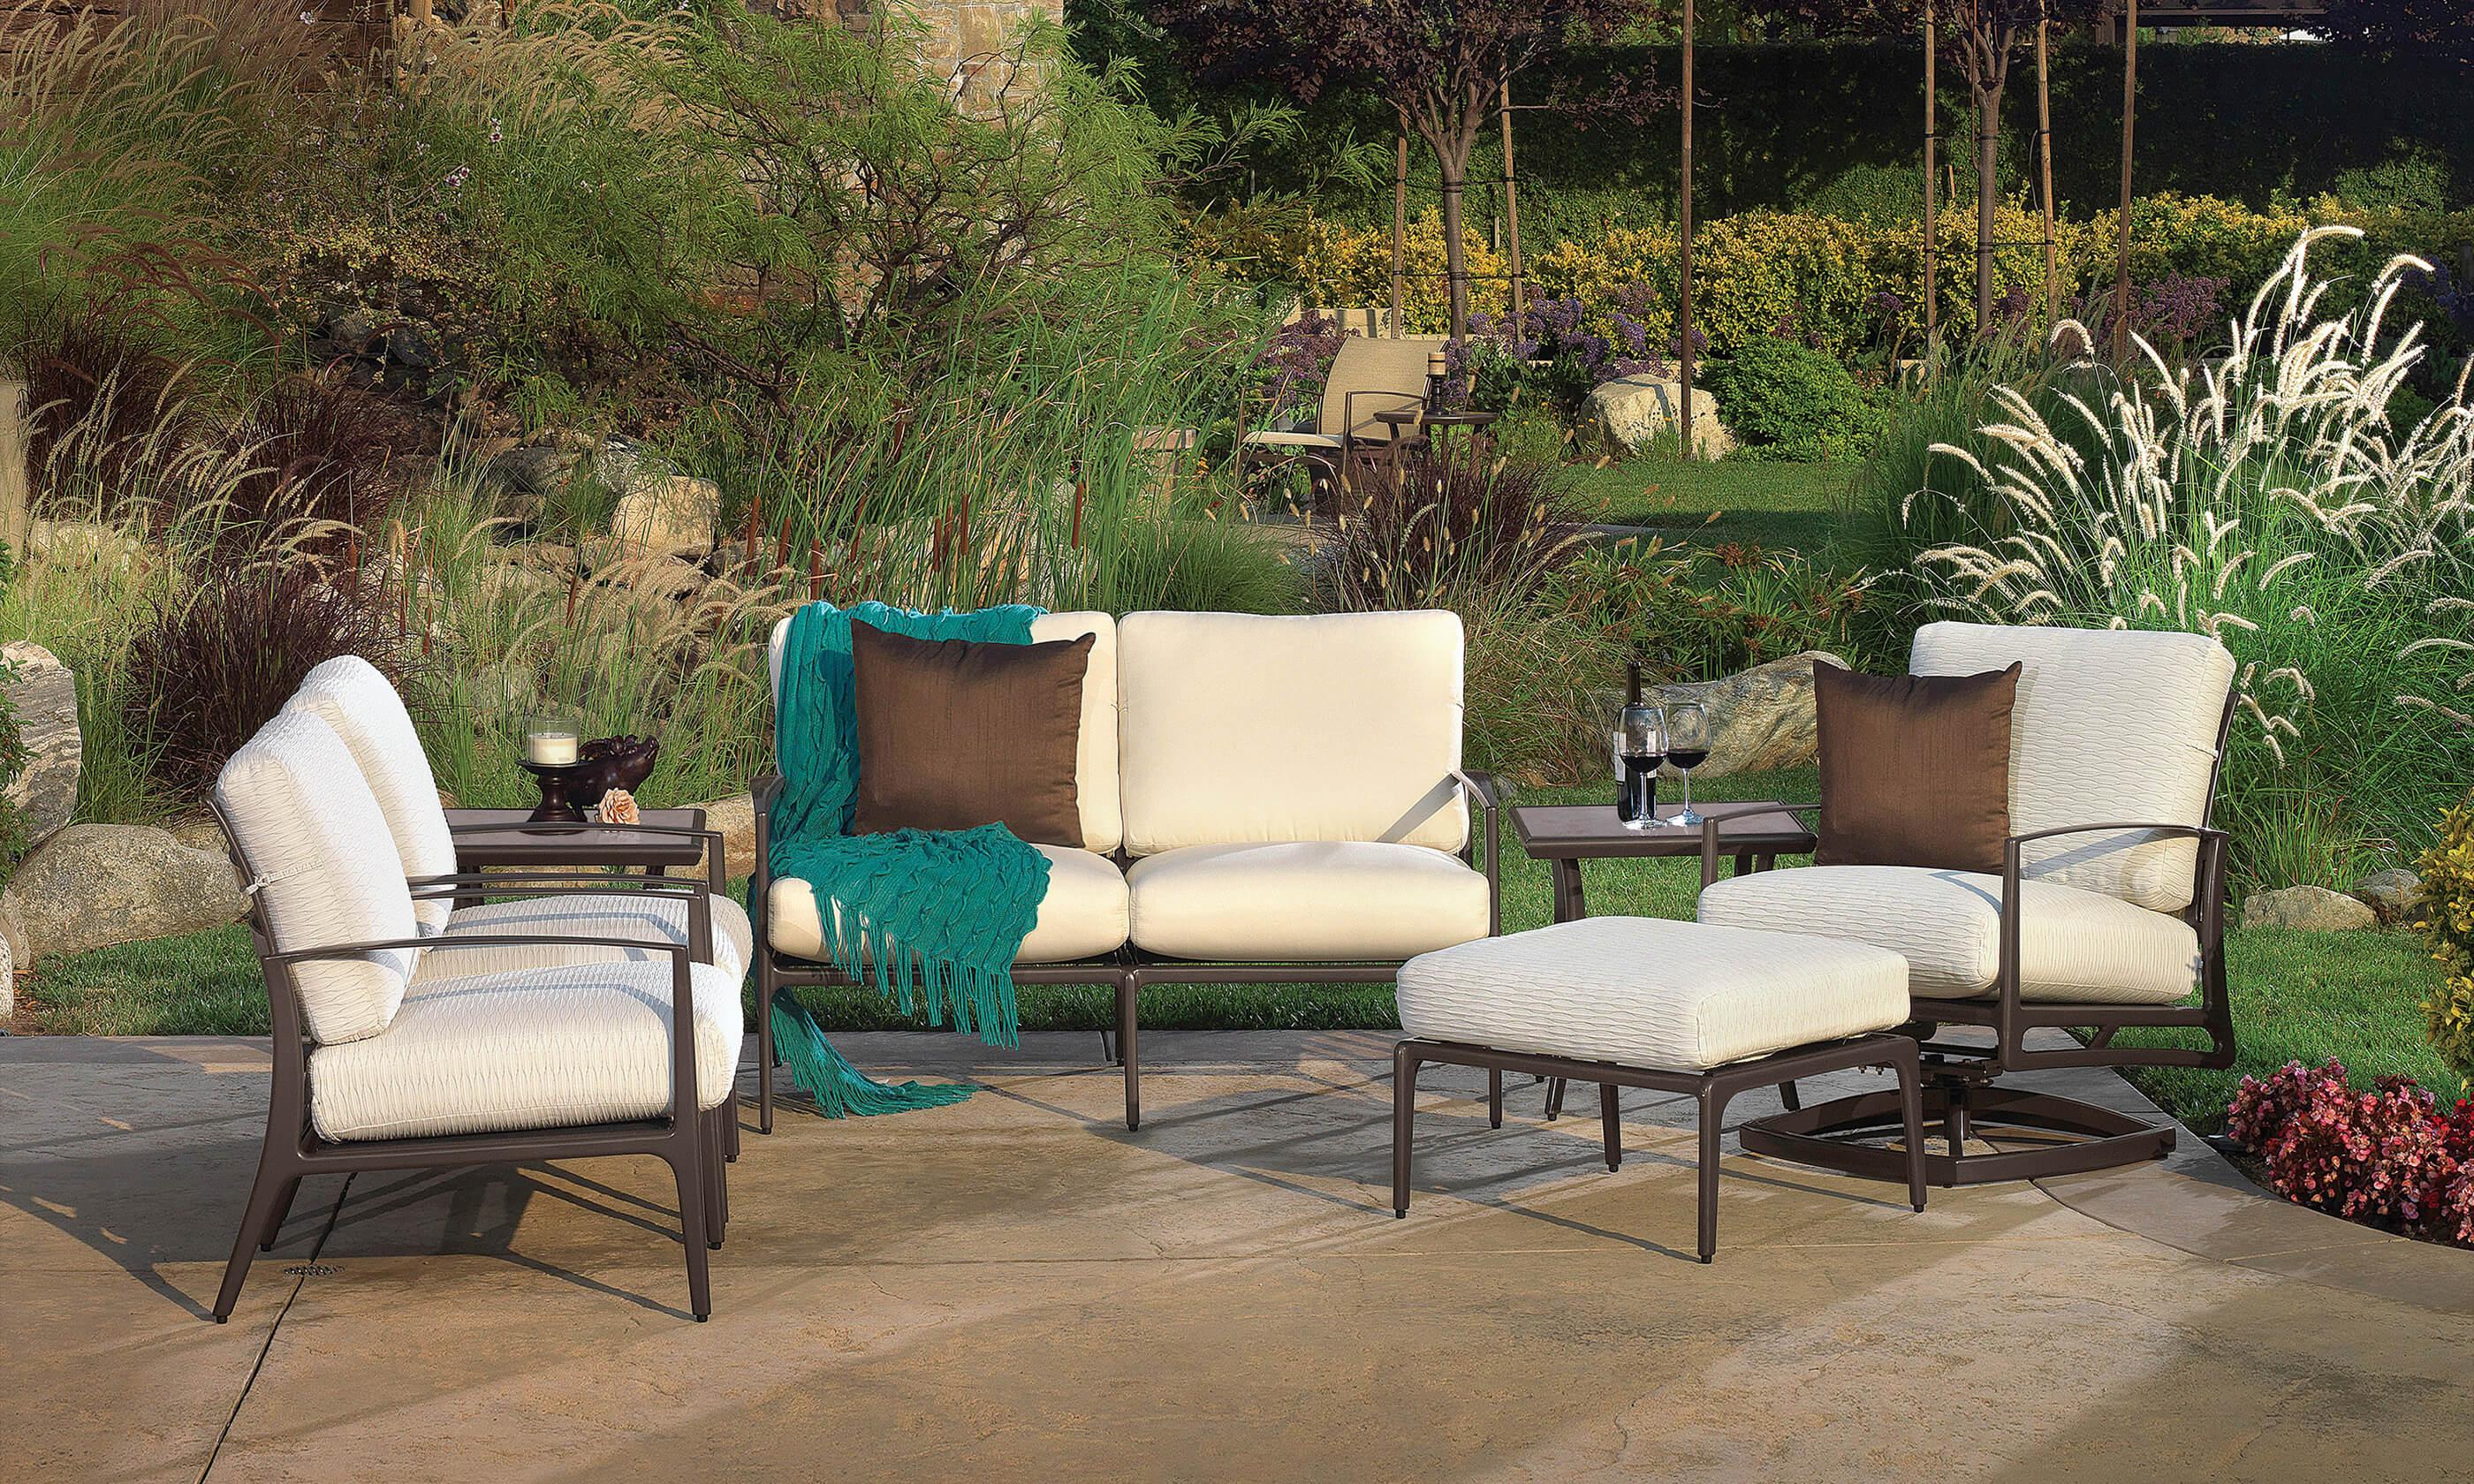 Gensun Casual Outdoor Patio Furniture